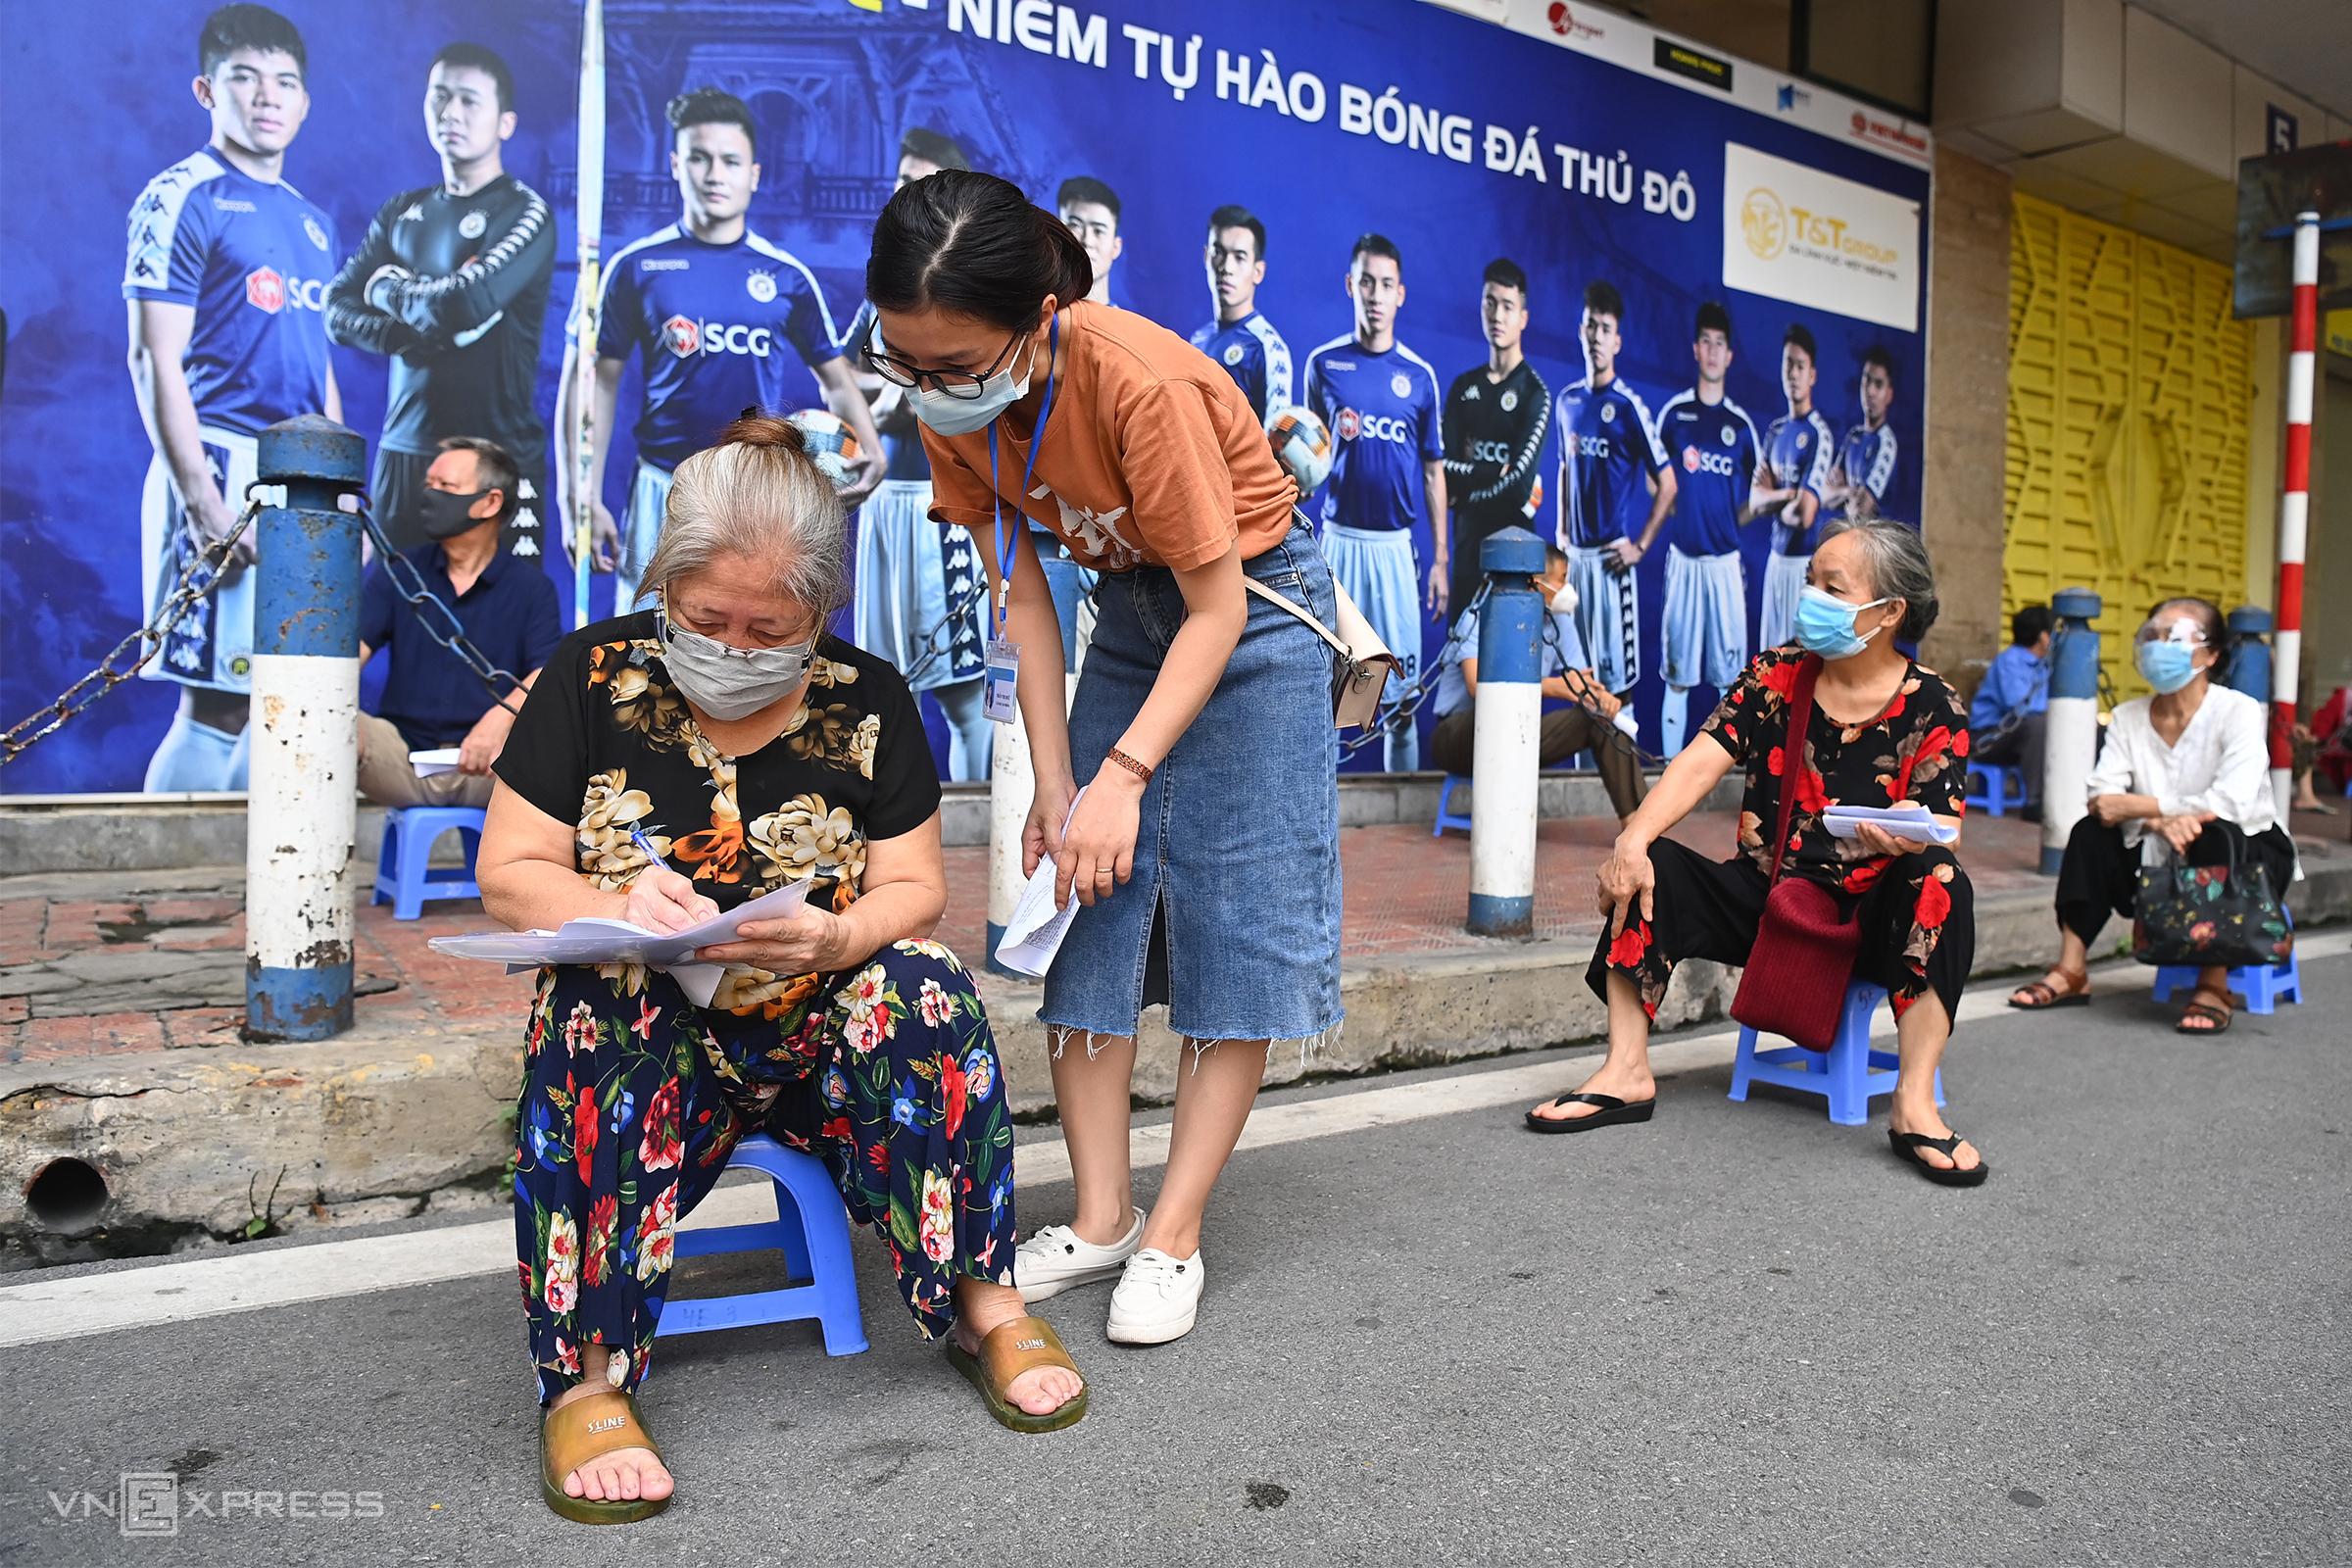 Hanoi deploys simultaneous Covid testing, vaccination sites